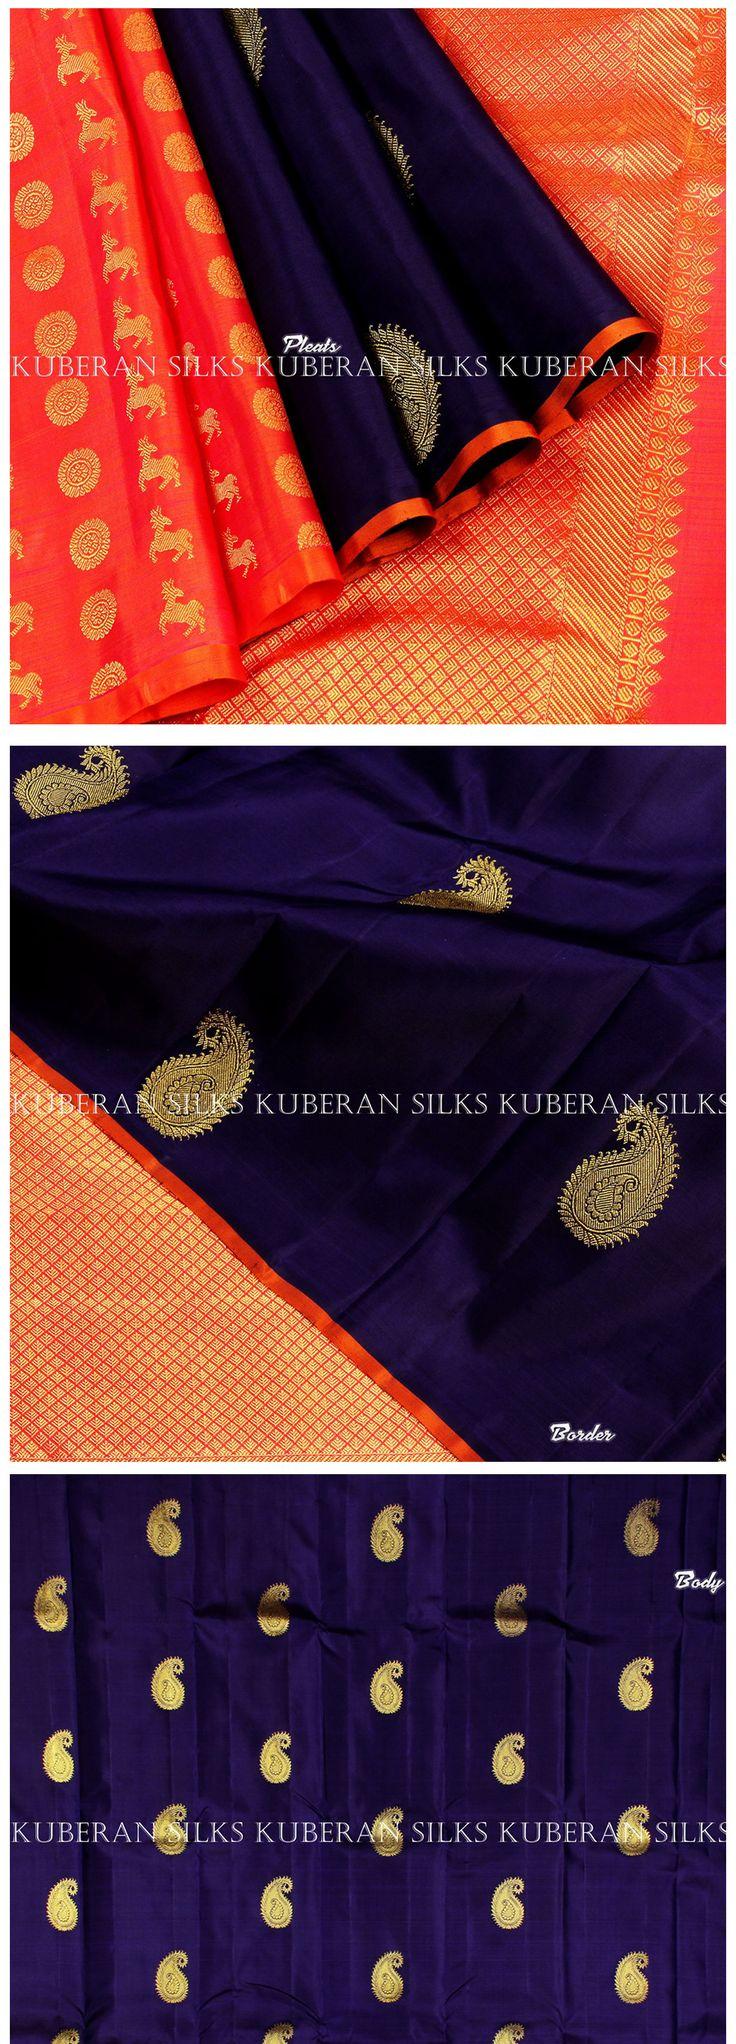 Kuberan Royal Blue Kanchivaram Silk Saree #kanchipuram #silksarees #kanchipuramsarees #online #kanchipuramsilk #sareesonline #purekanchipuram #silksarees #buy #shop #latest #offer